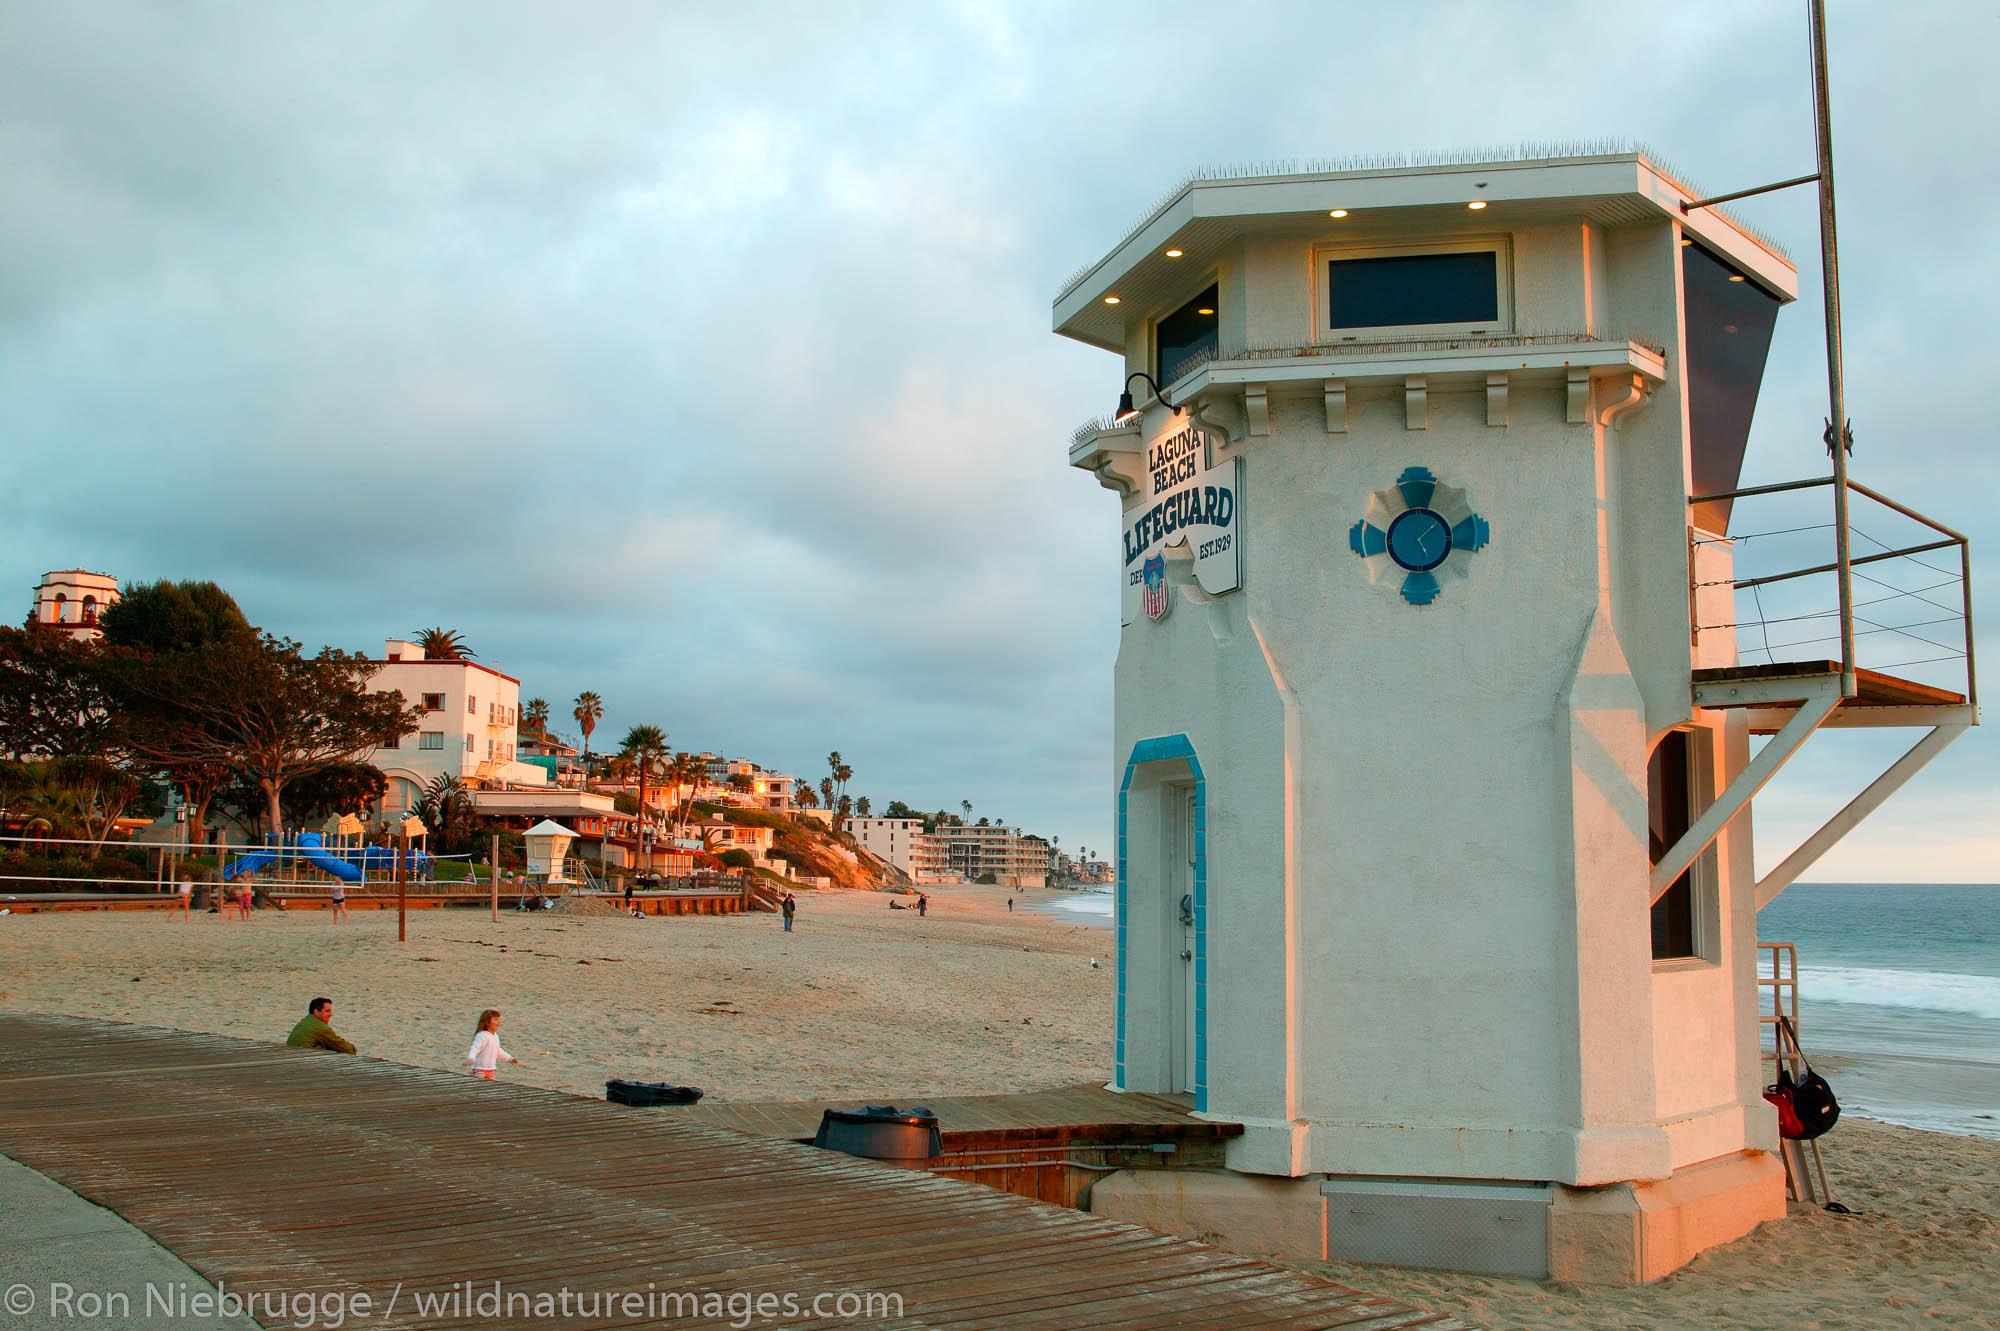 Life Guard tower at Laguna Beach, California.